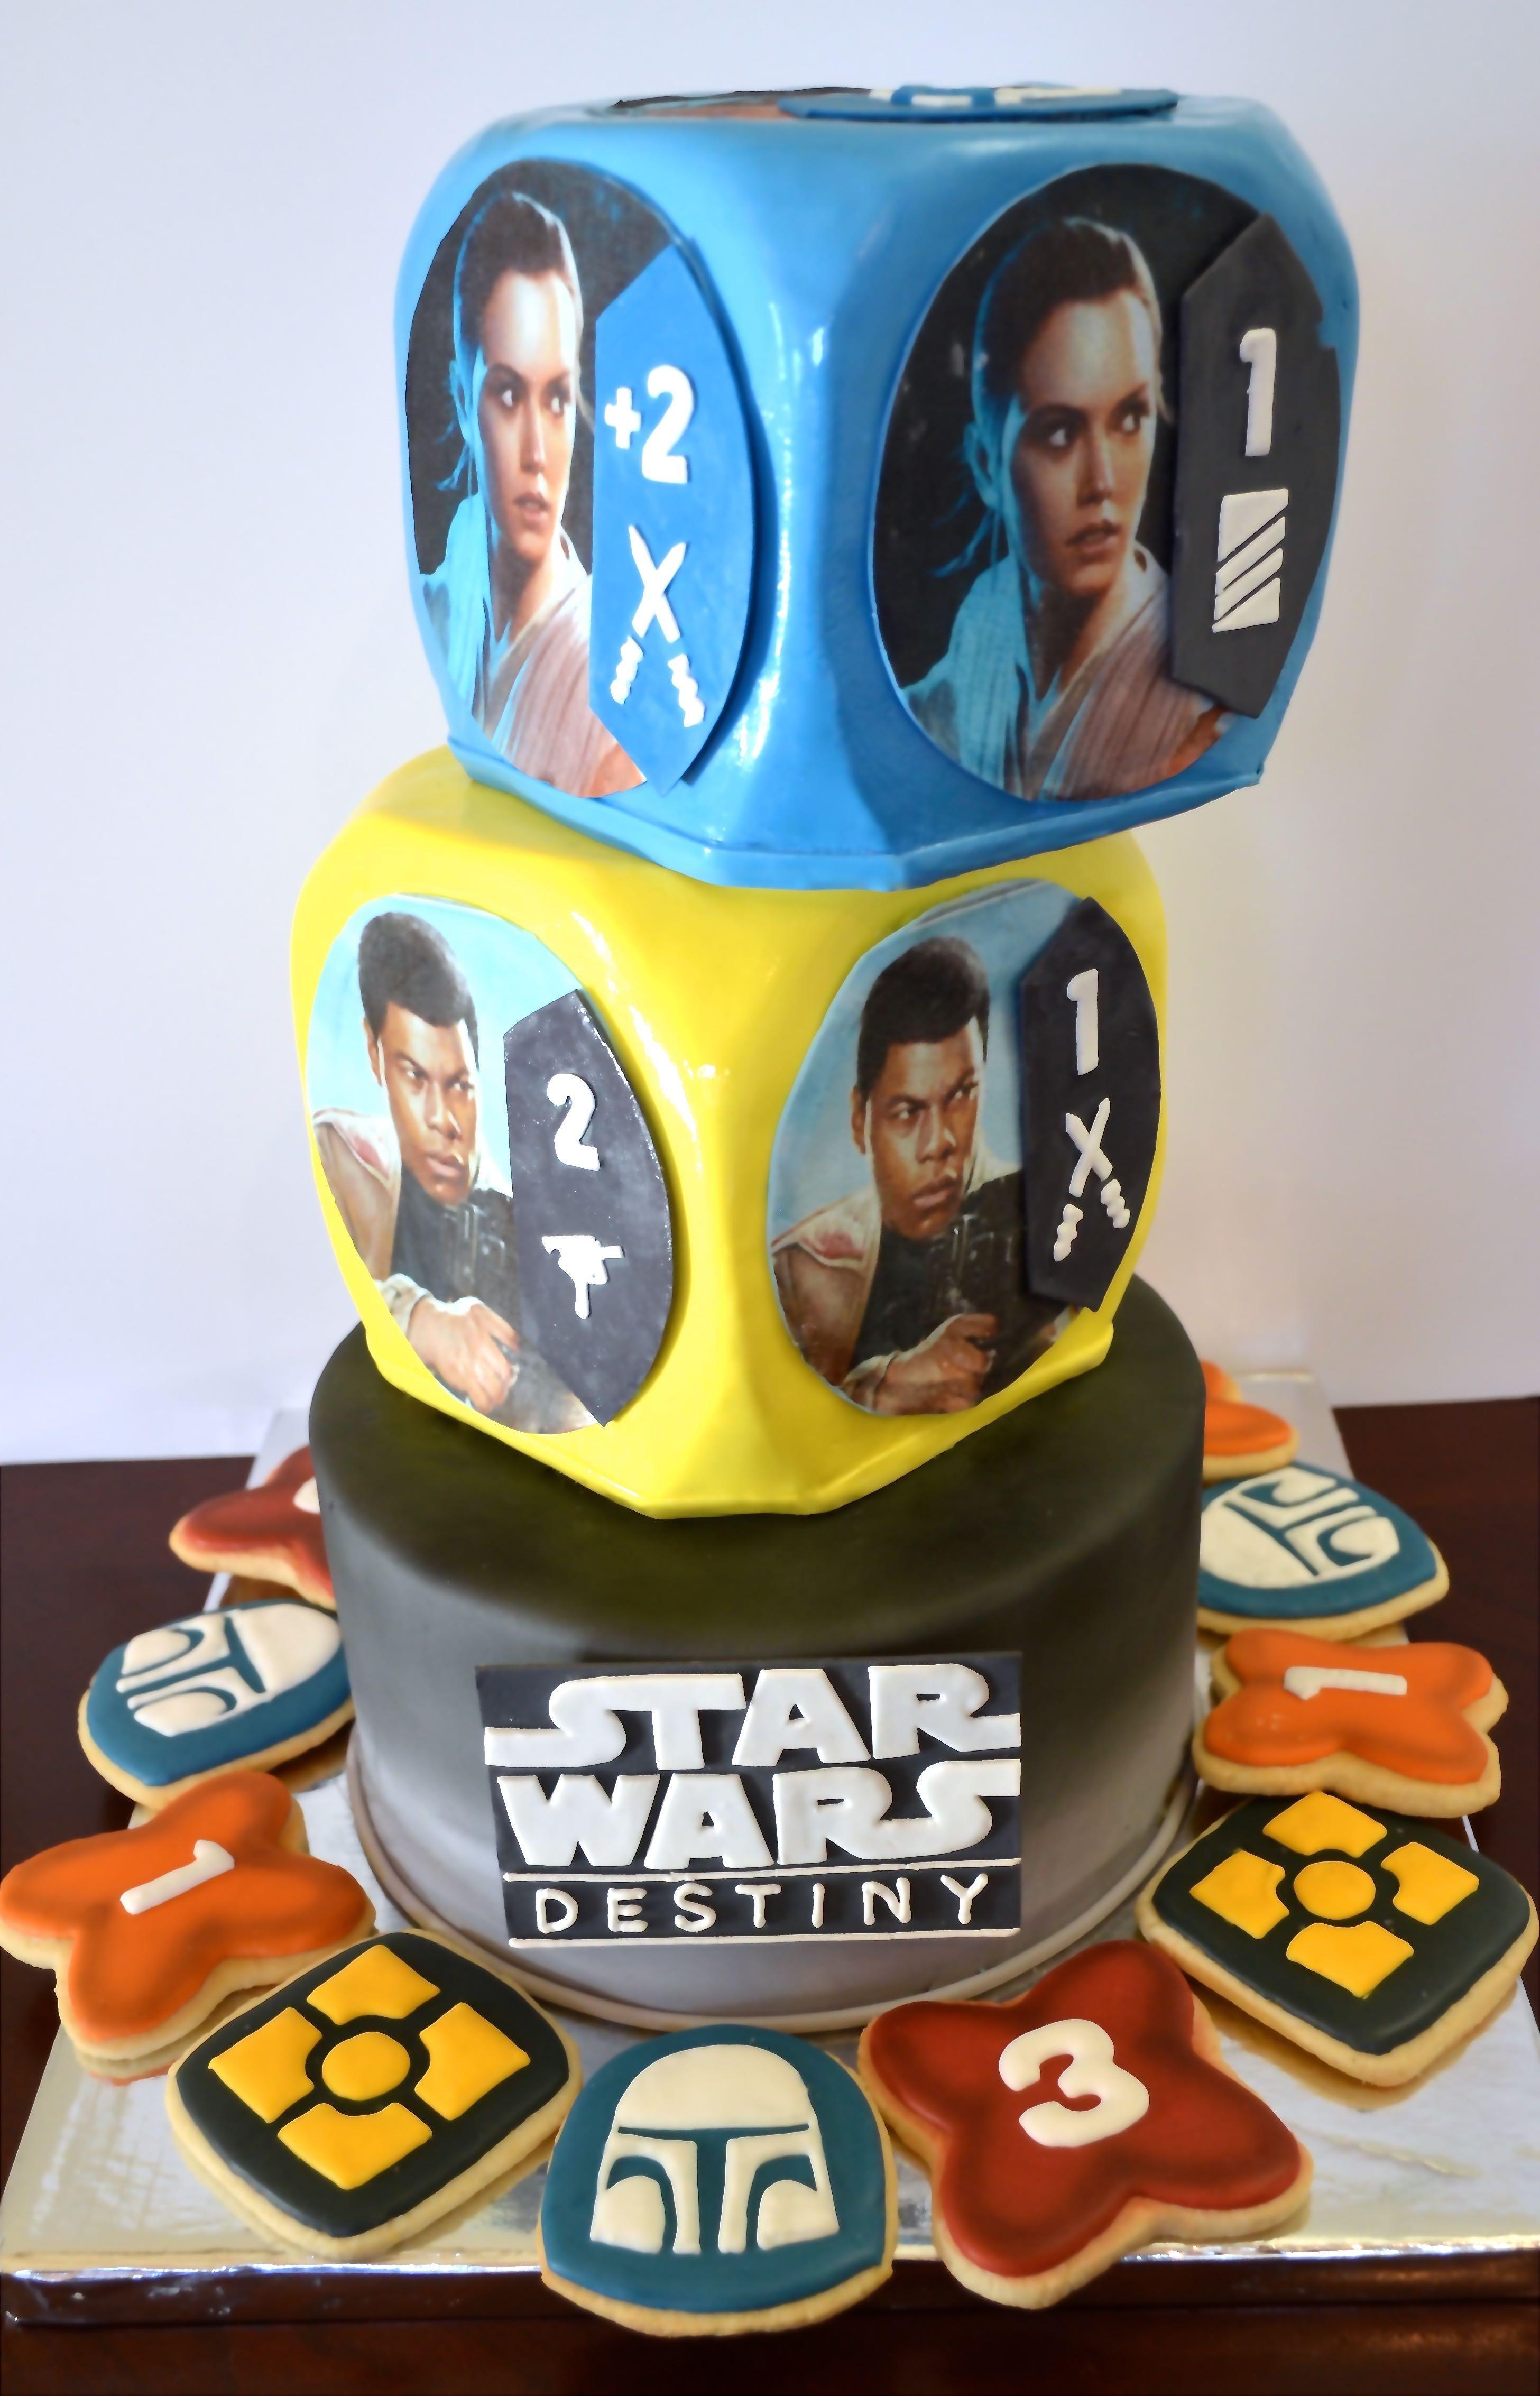 Star wars destiny cake star wars birthday star war